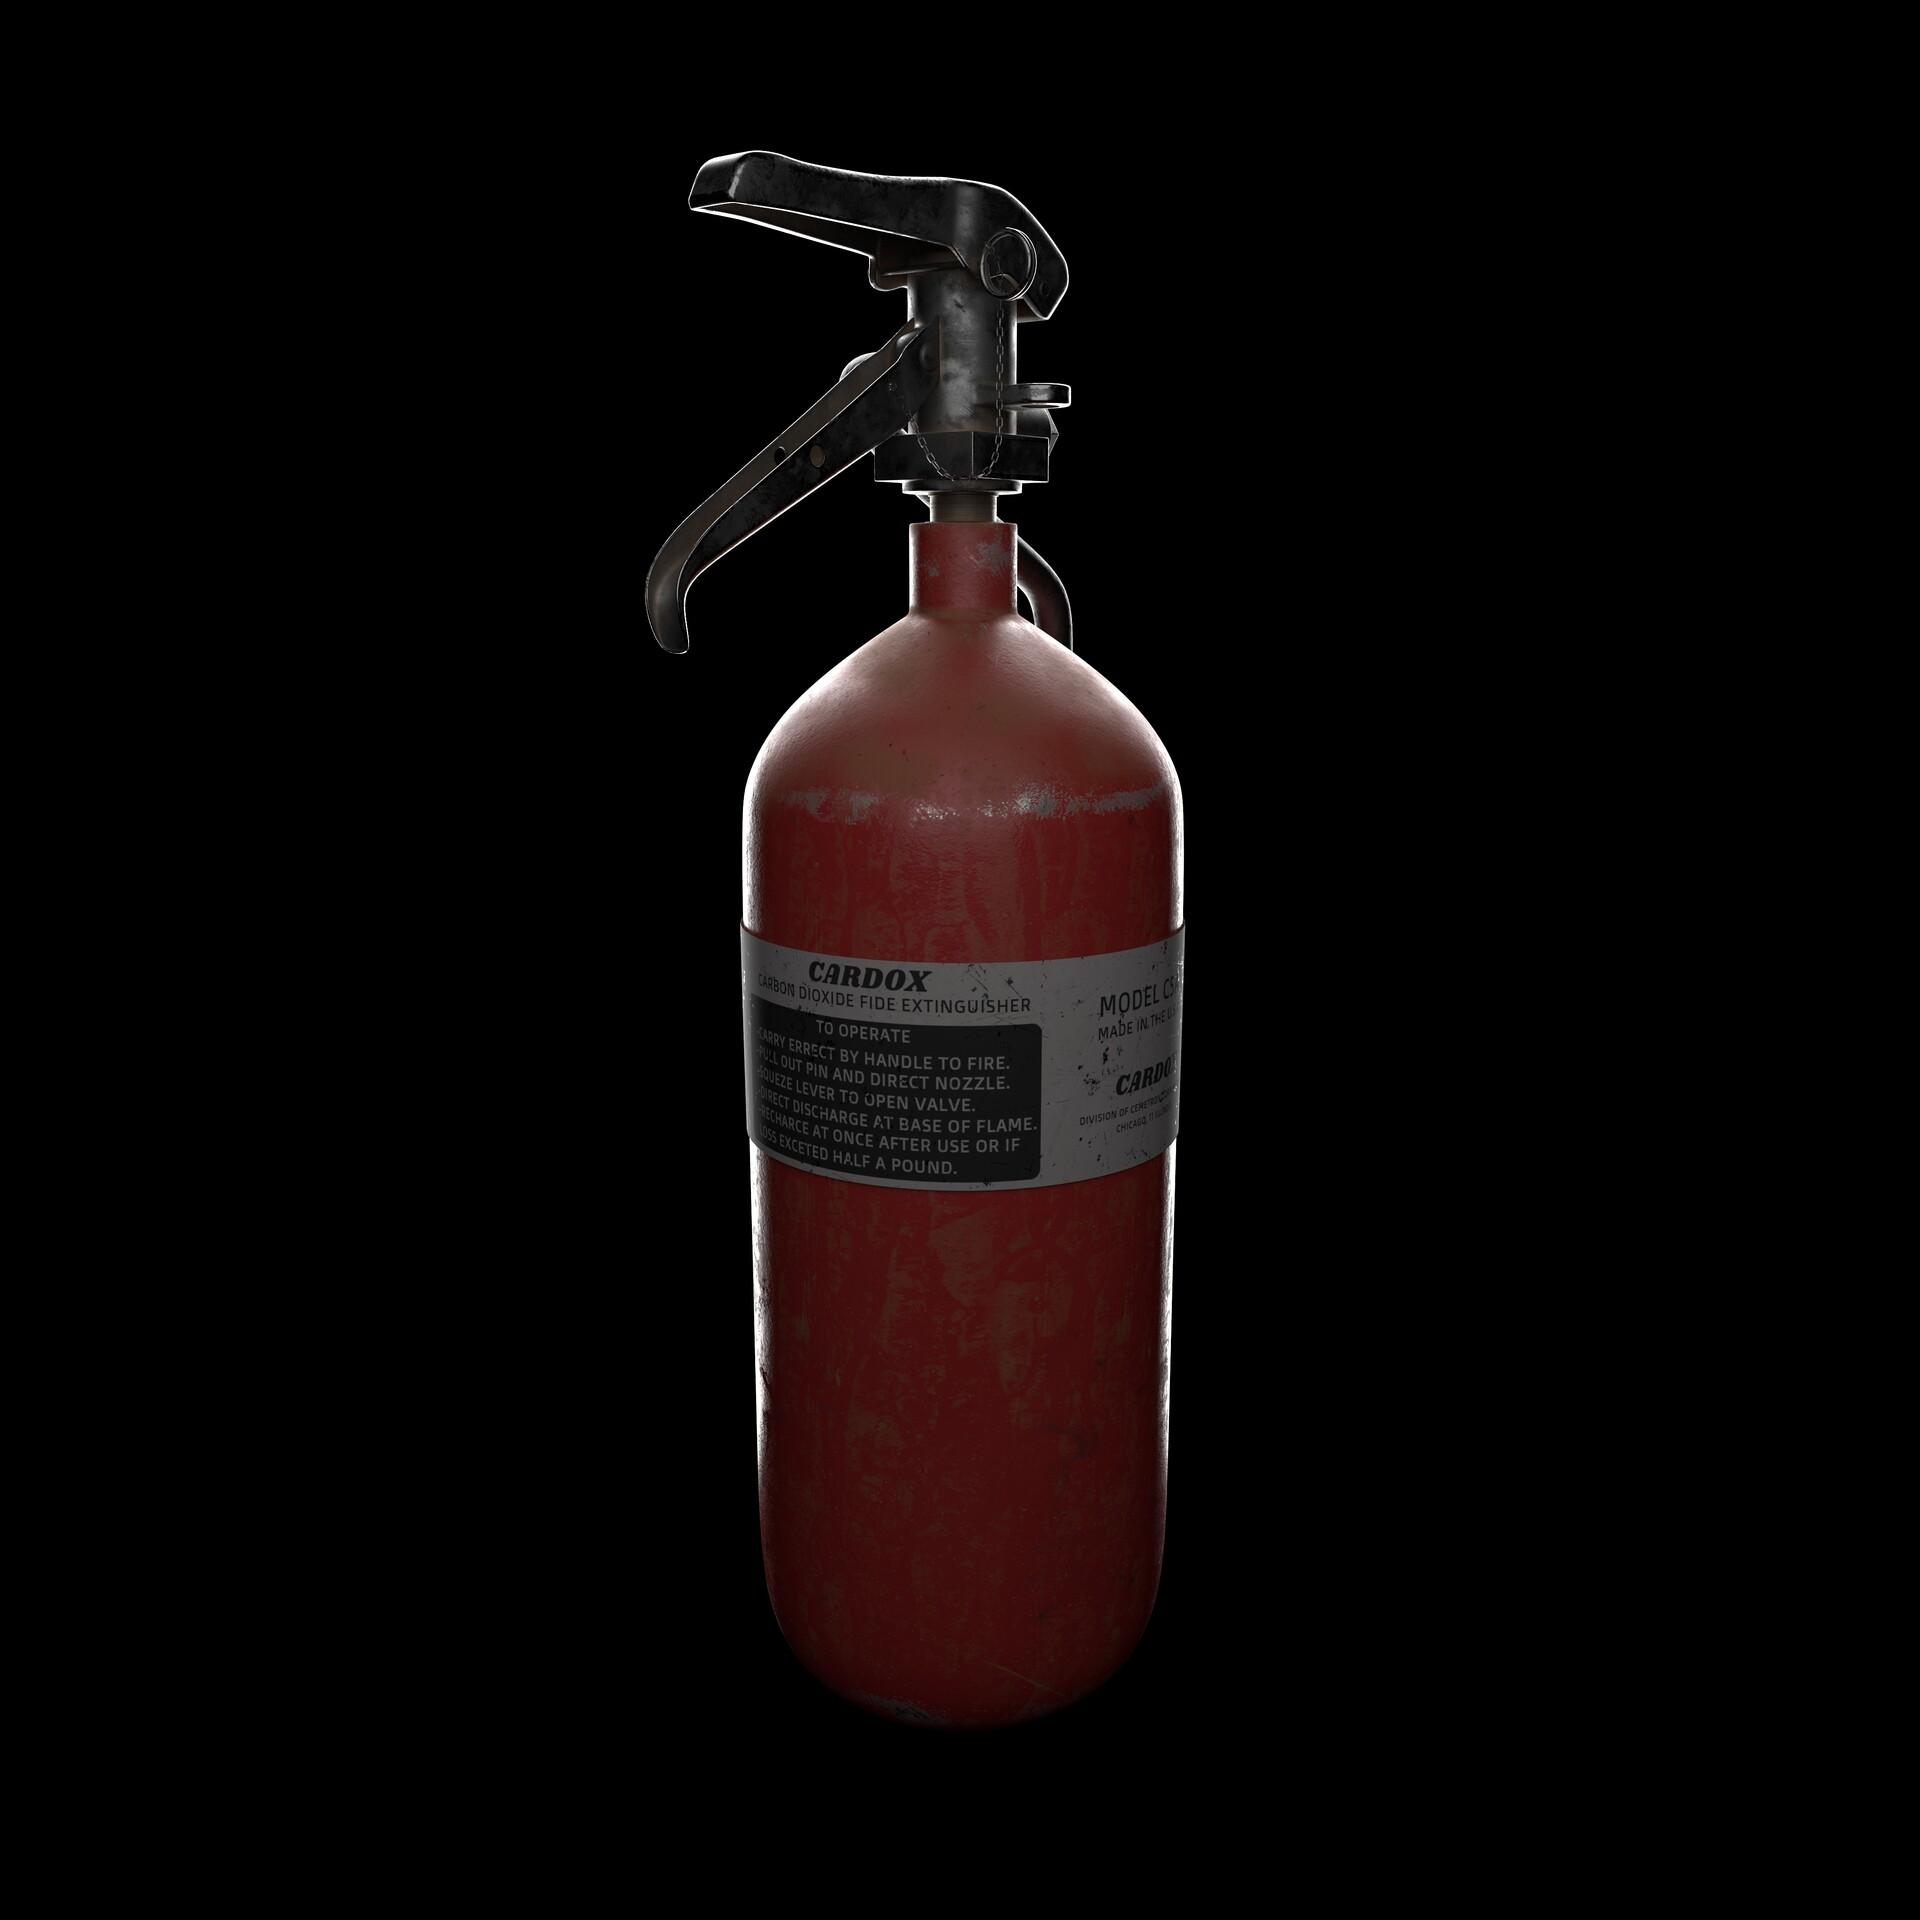 Darko mitev fireextinguisher03